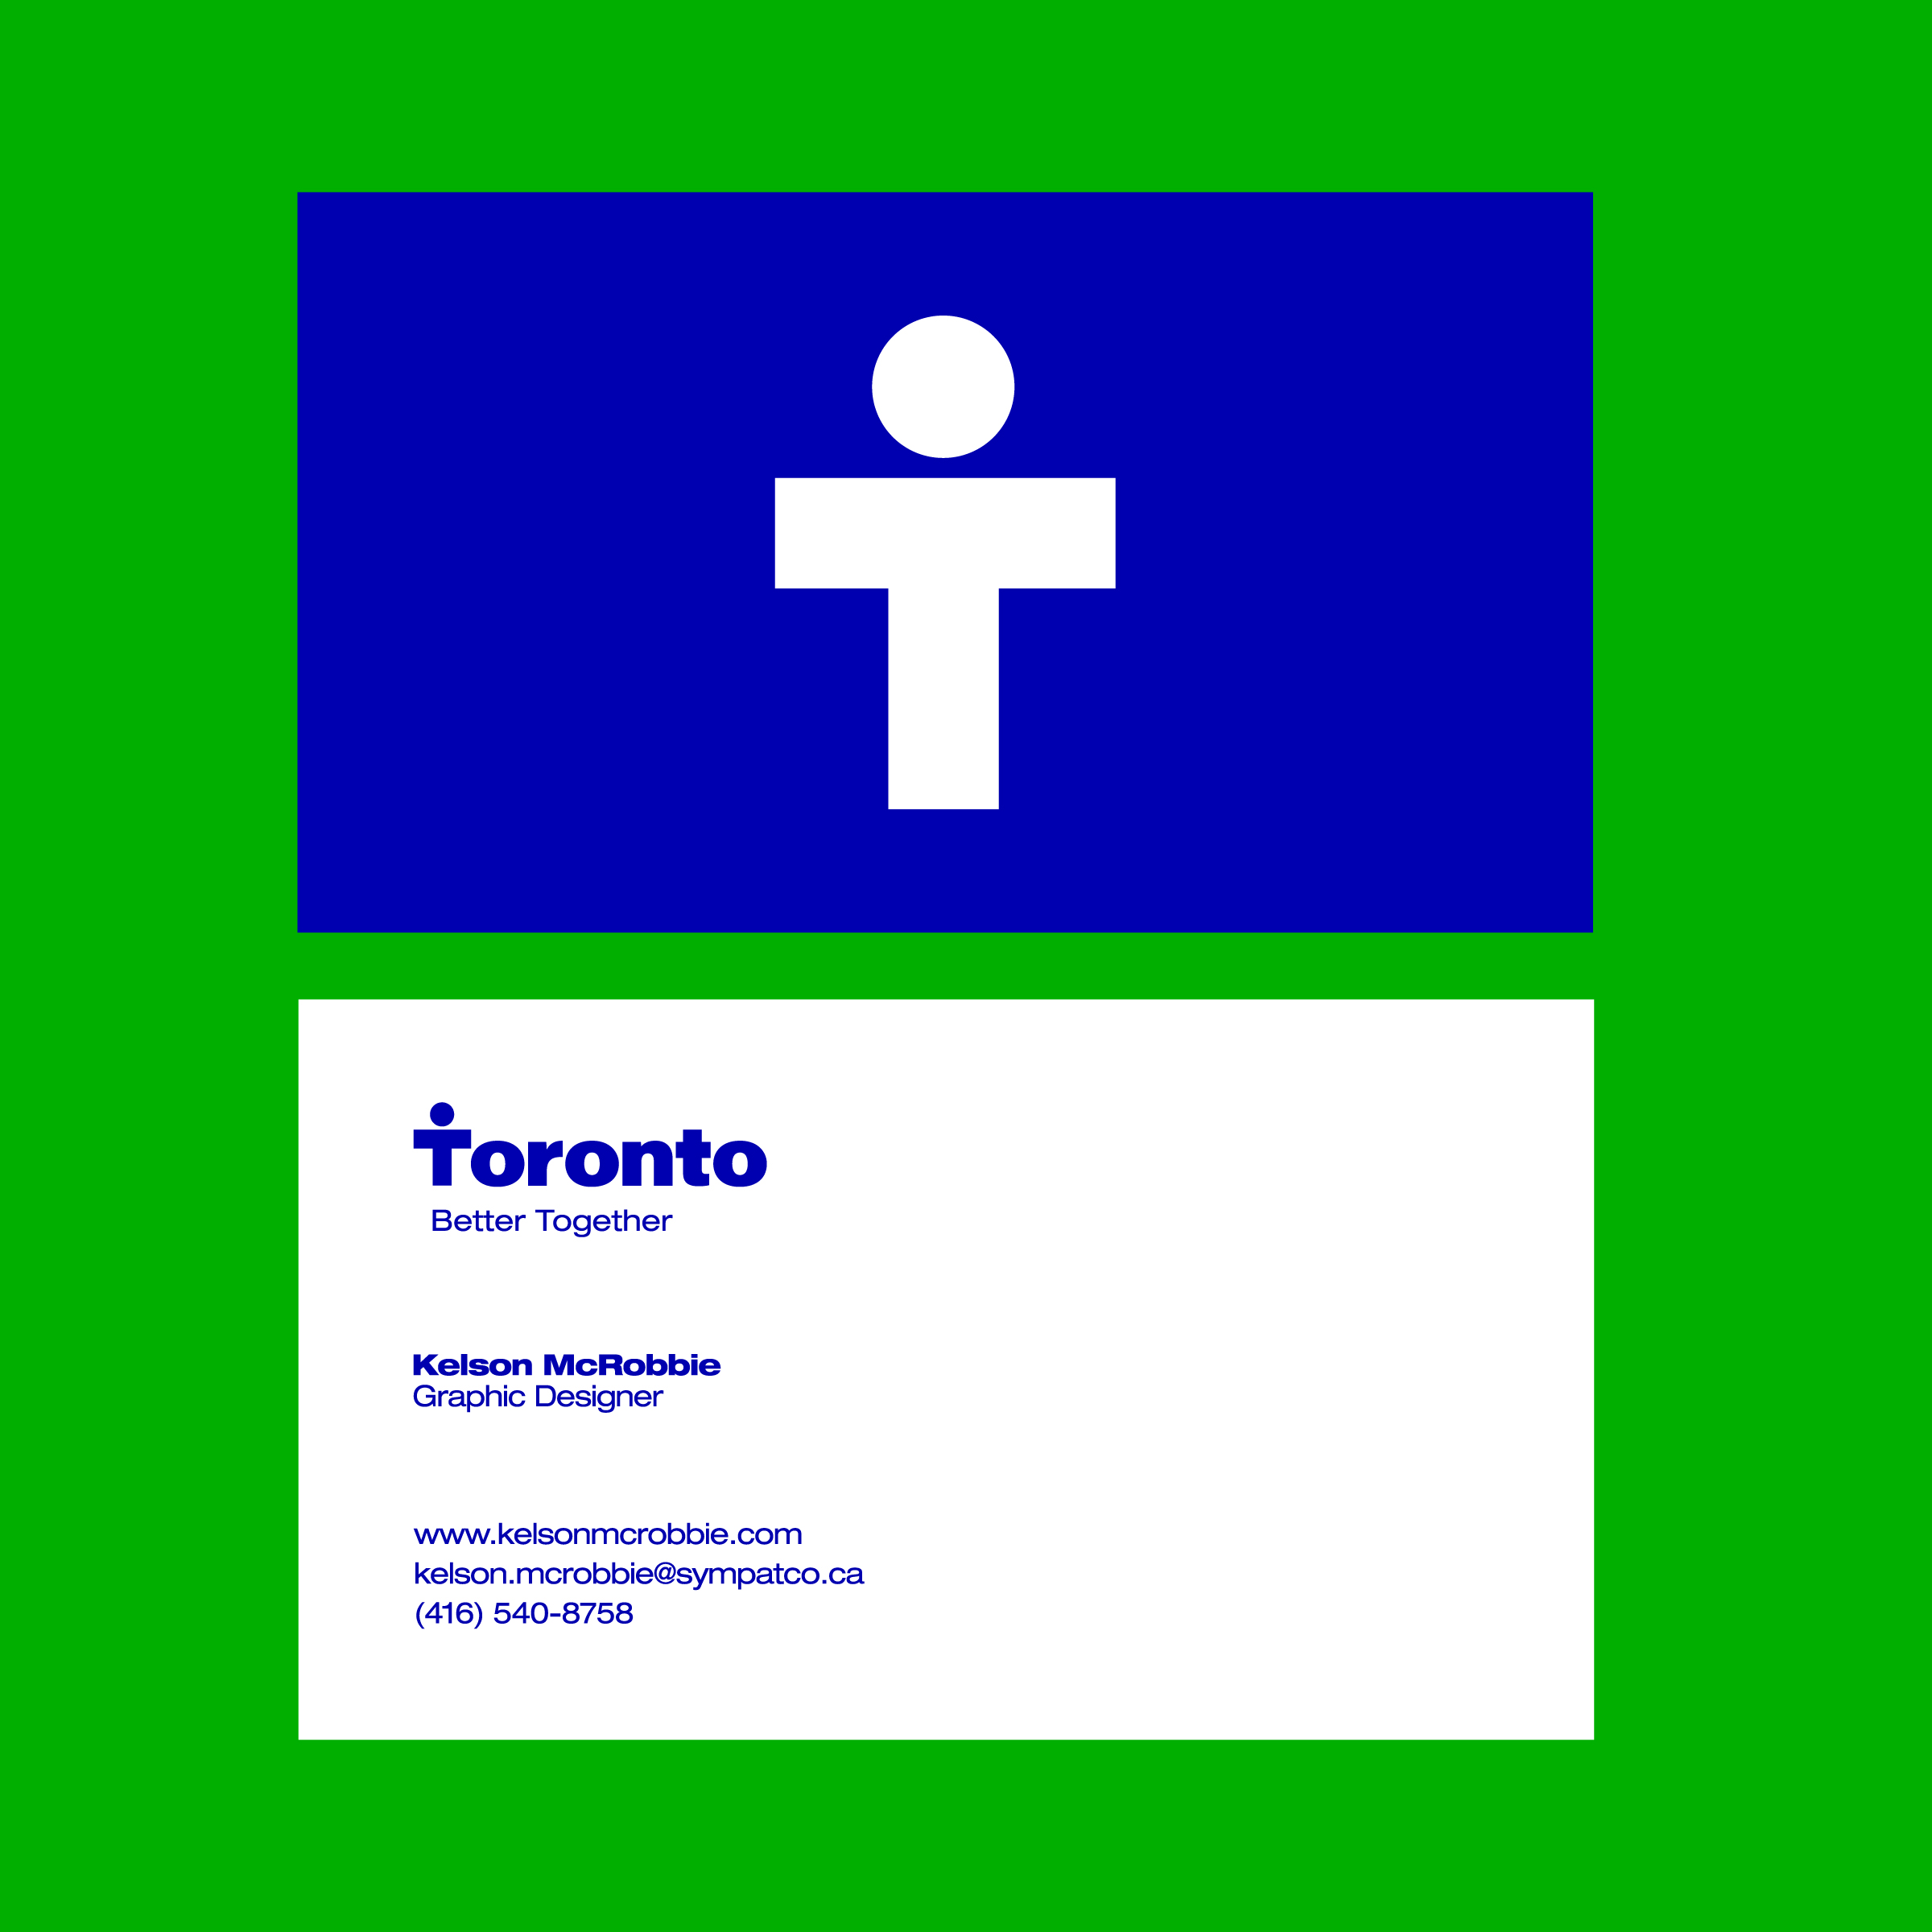 Toronto_BrandBook-15